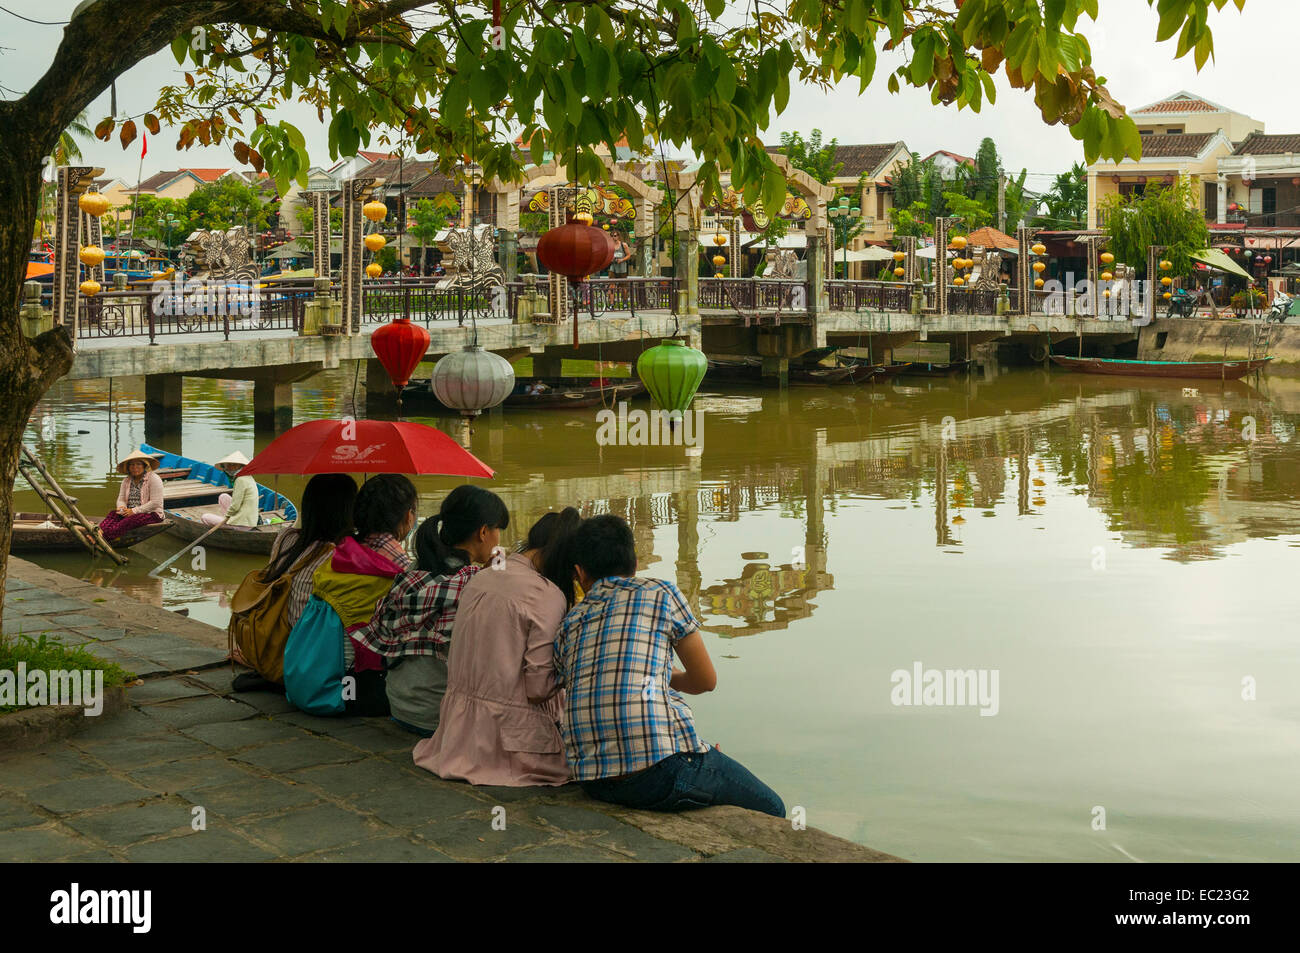 Riverside in Old Quarter, Hoi An, Vietnam - Stock Image